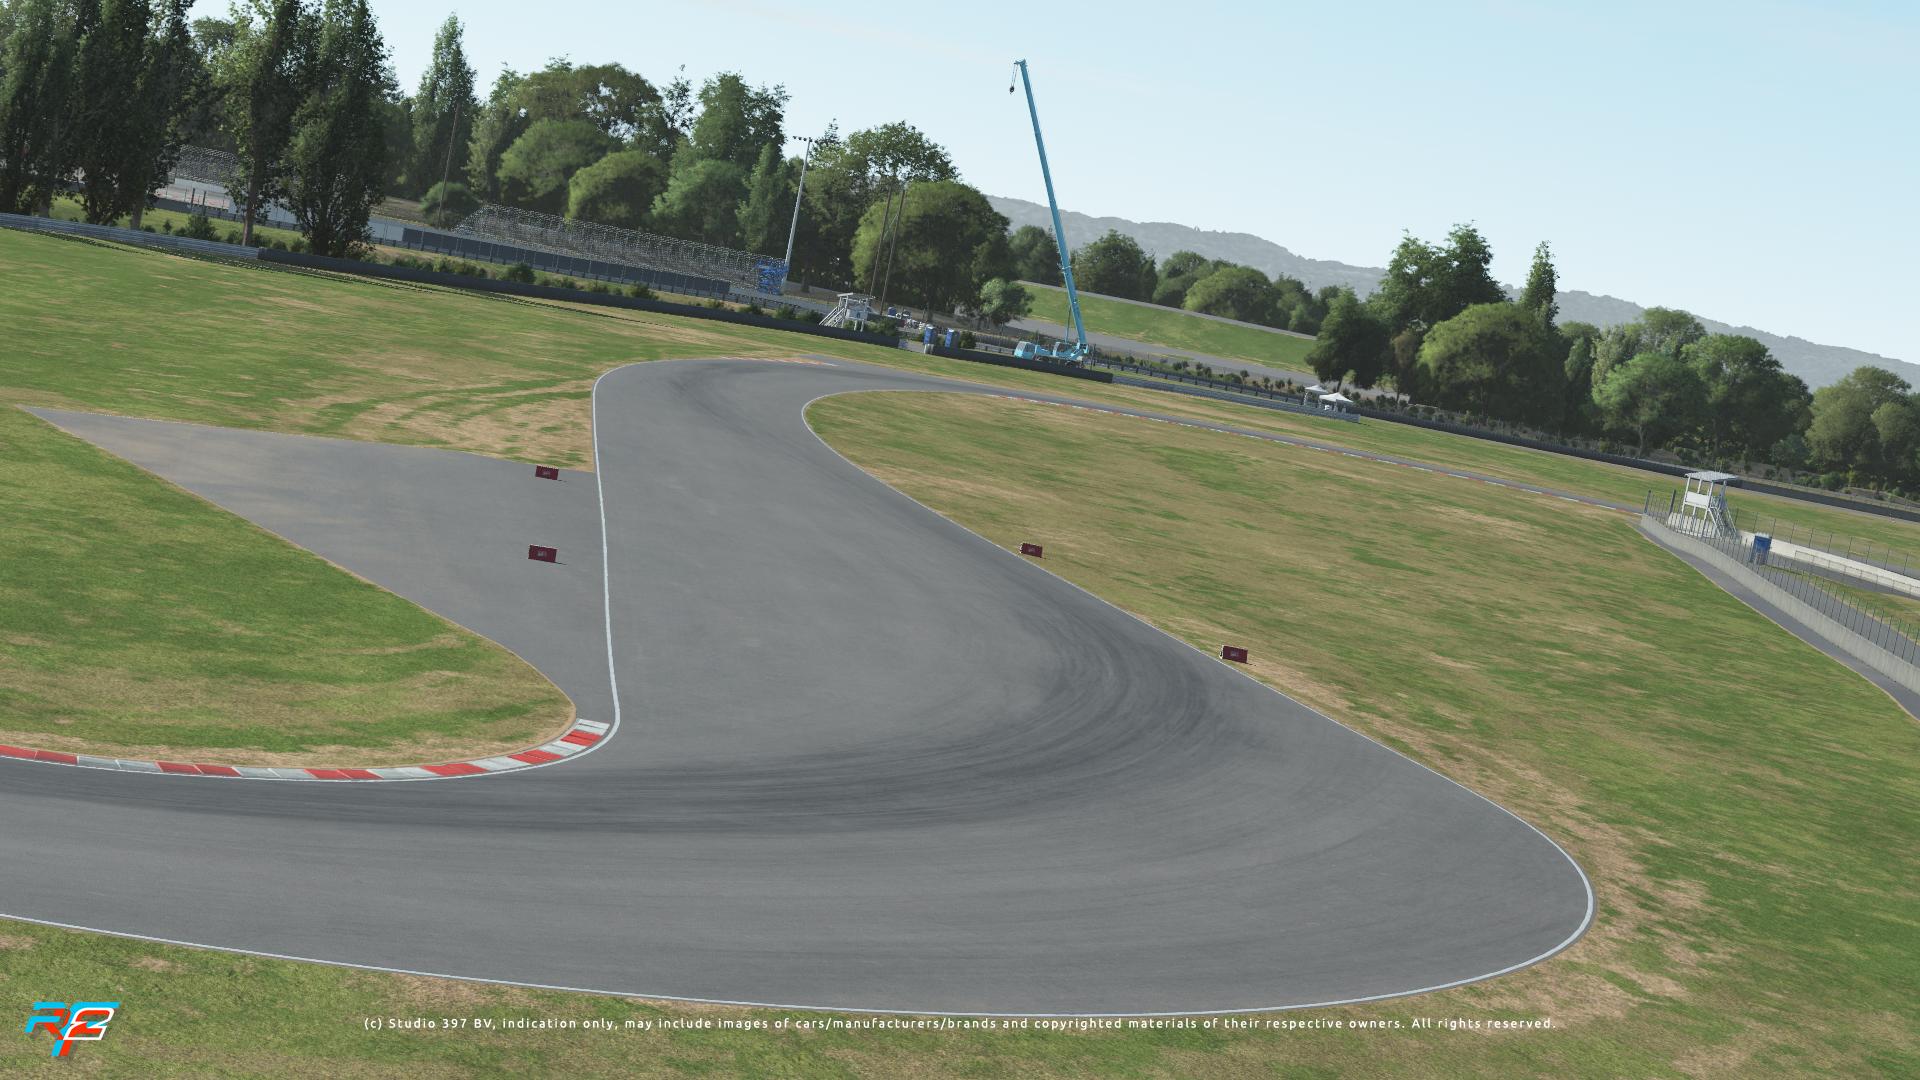 portland_2020_screen_05 Portland International Raceway for rFactor 2 – Released